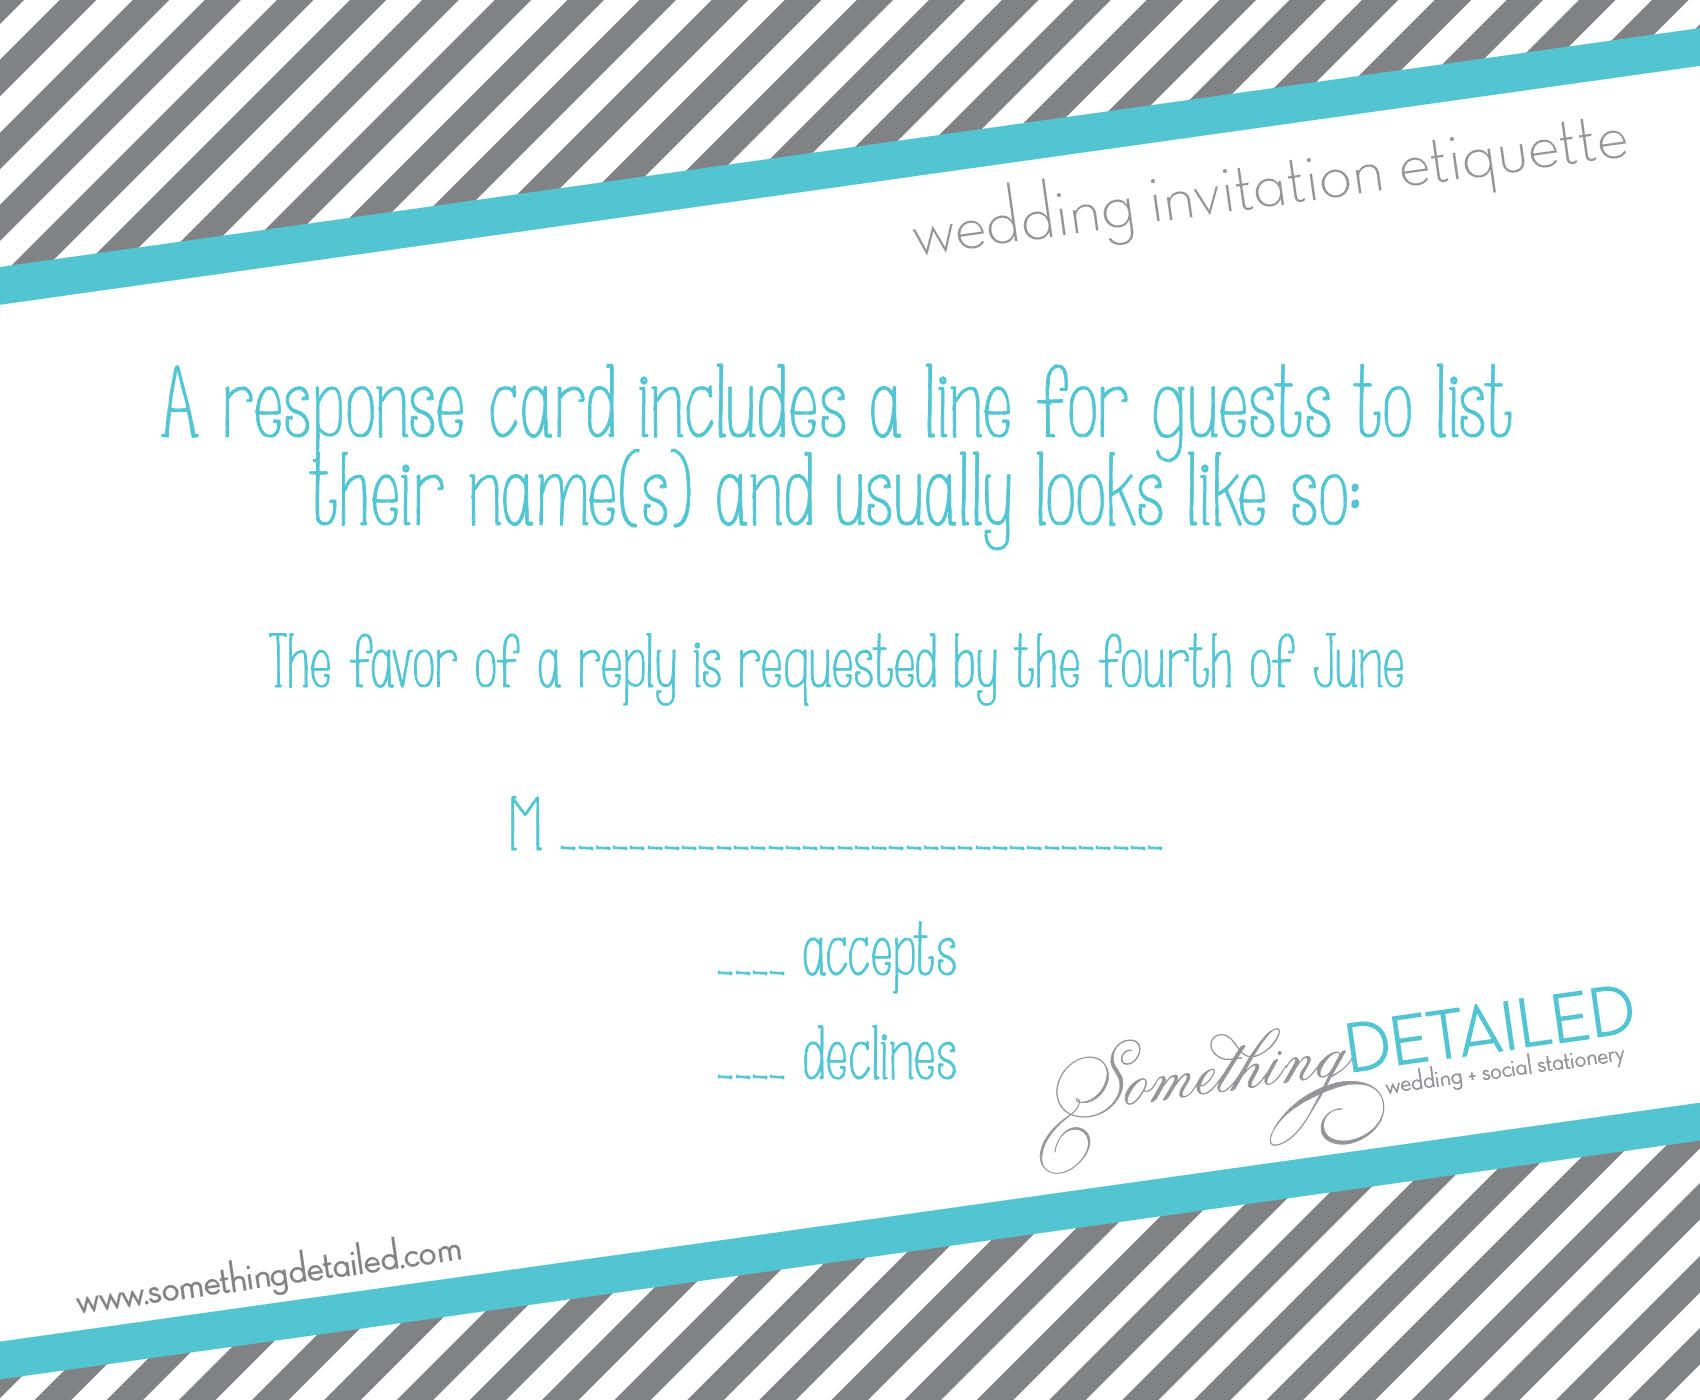 rsvp cards wedding invitations pinterest